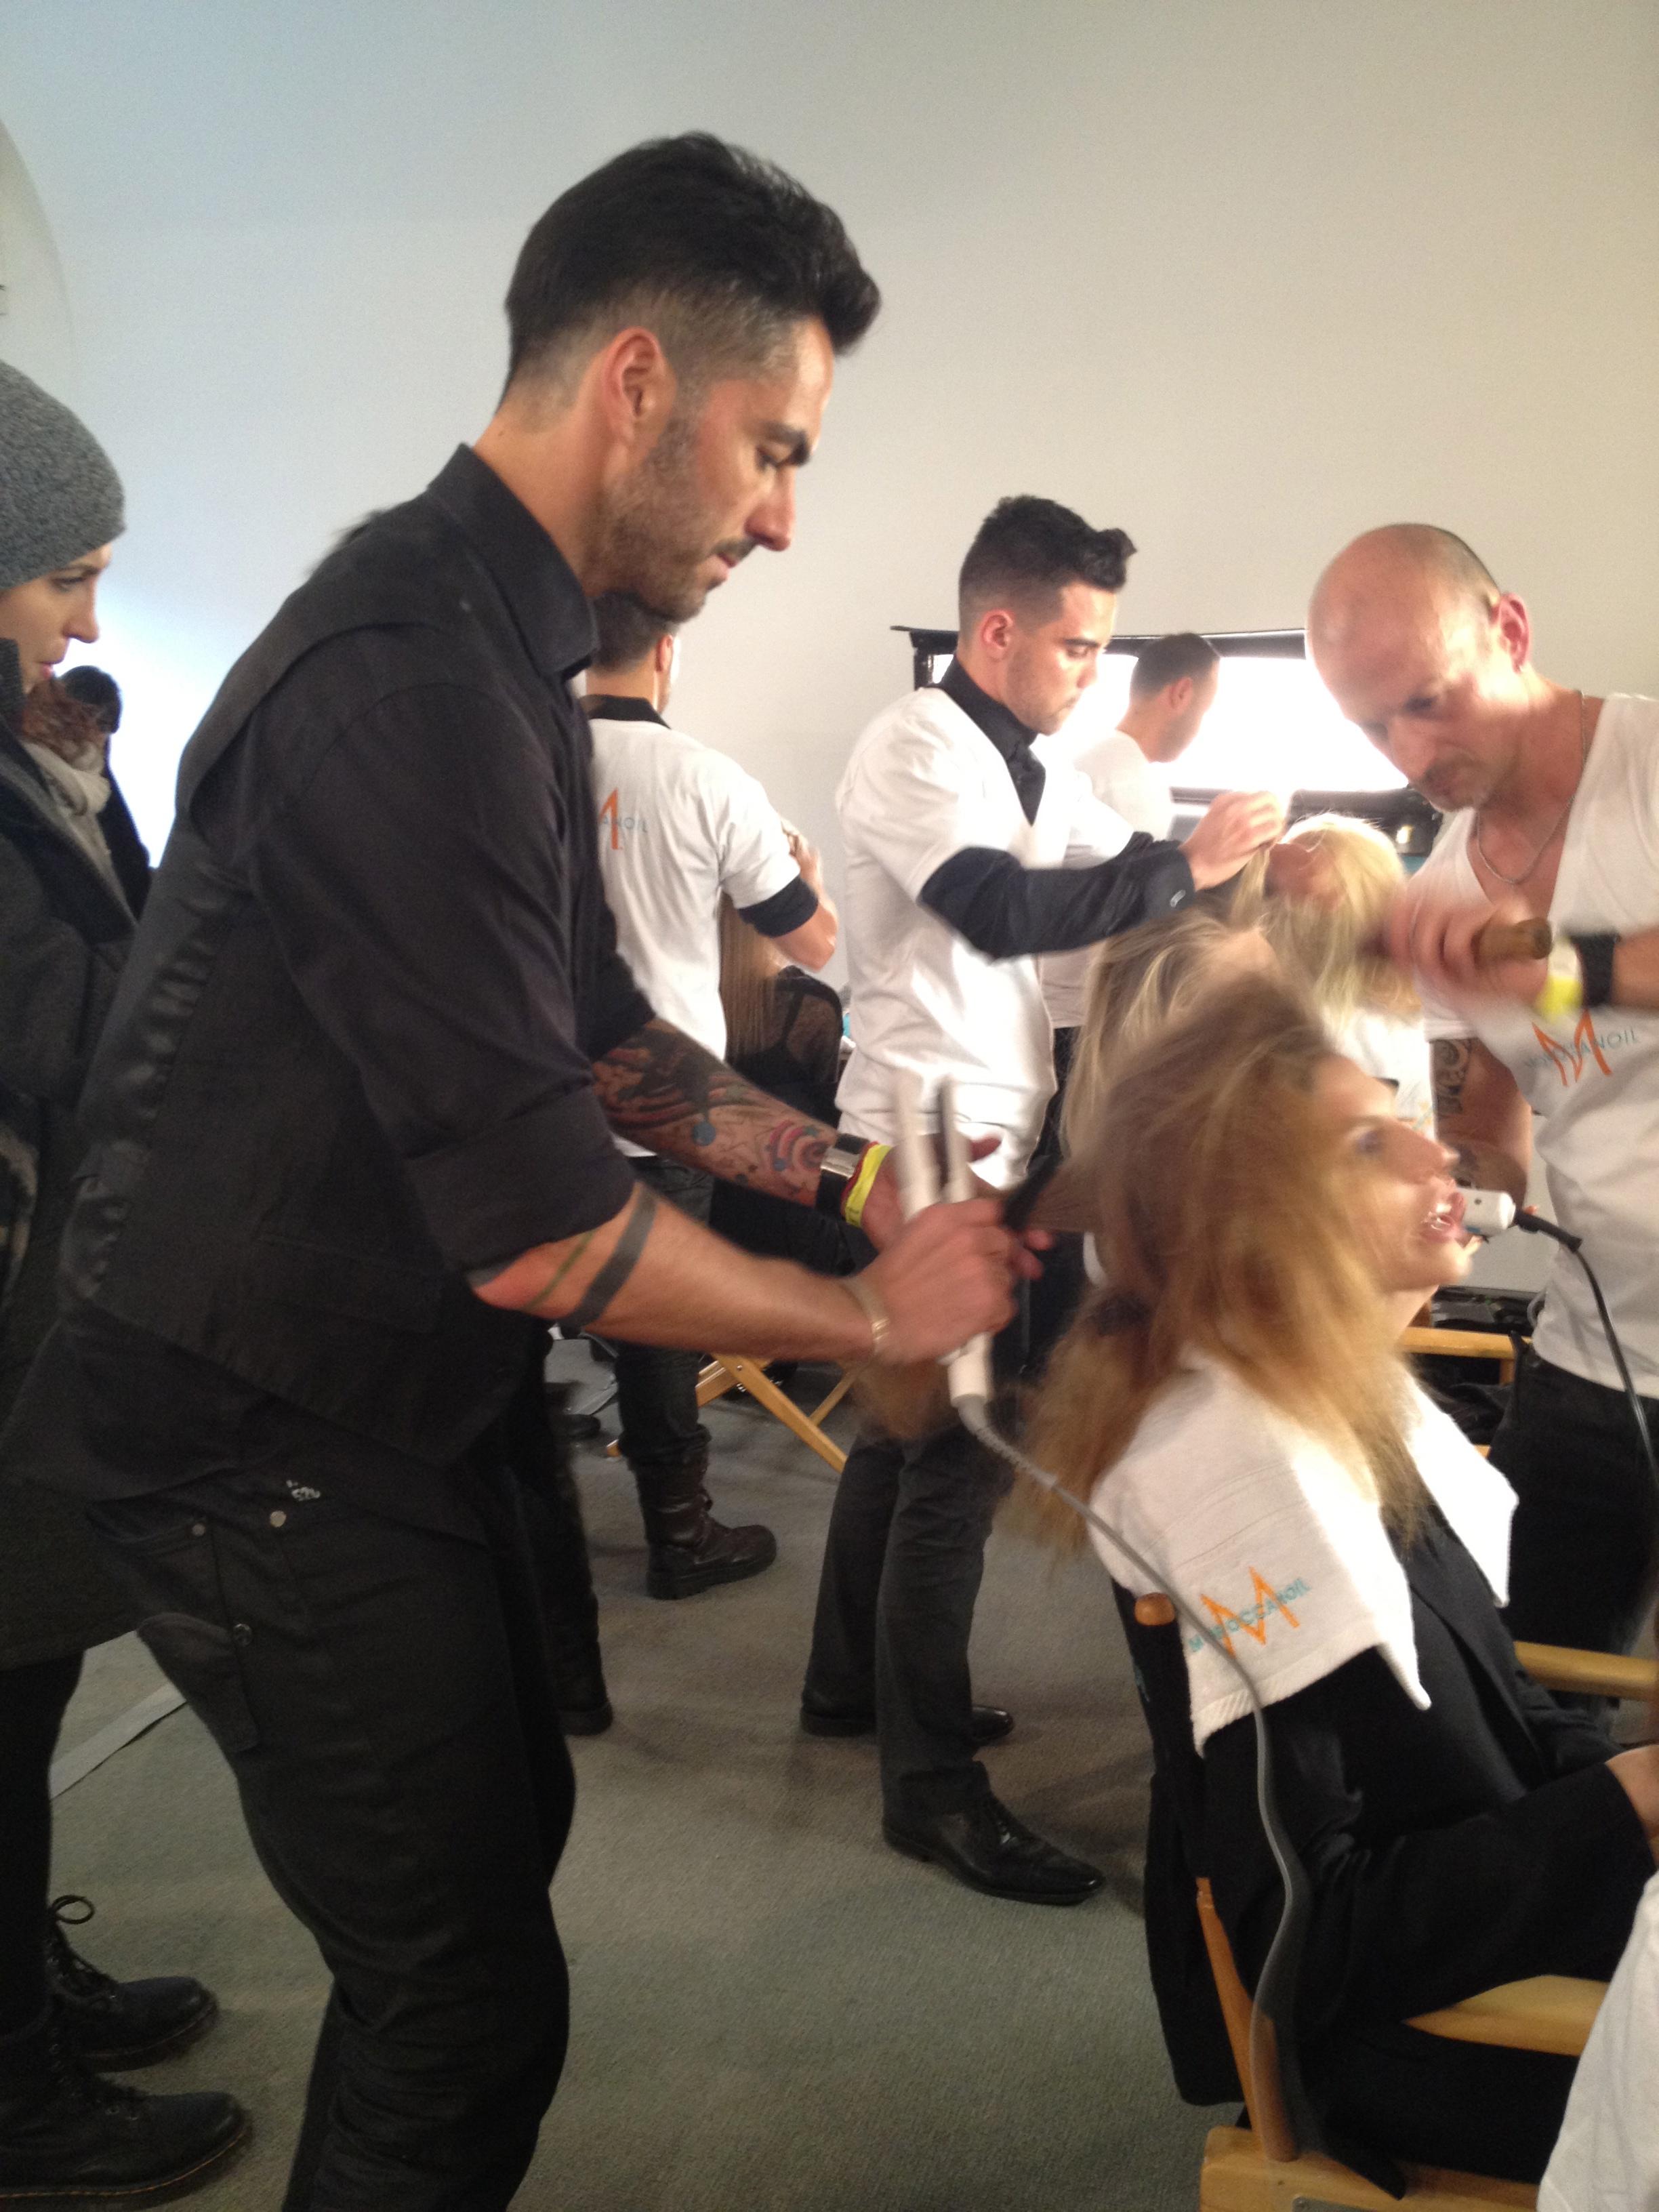 Antonio Corral Calero smoothes hair with flat-iron.